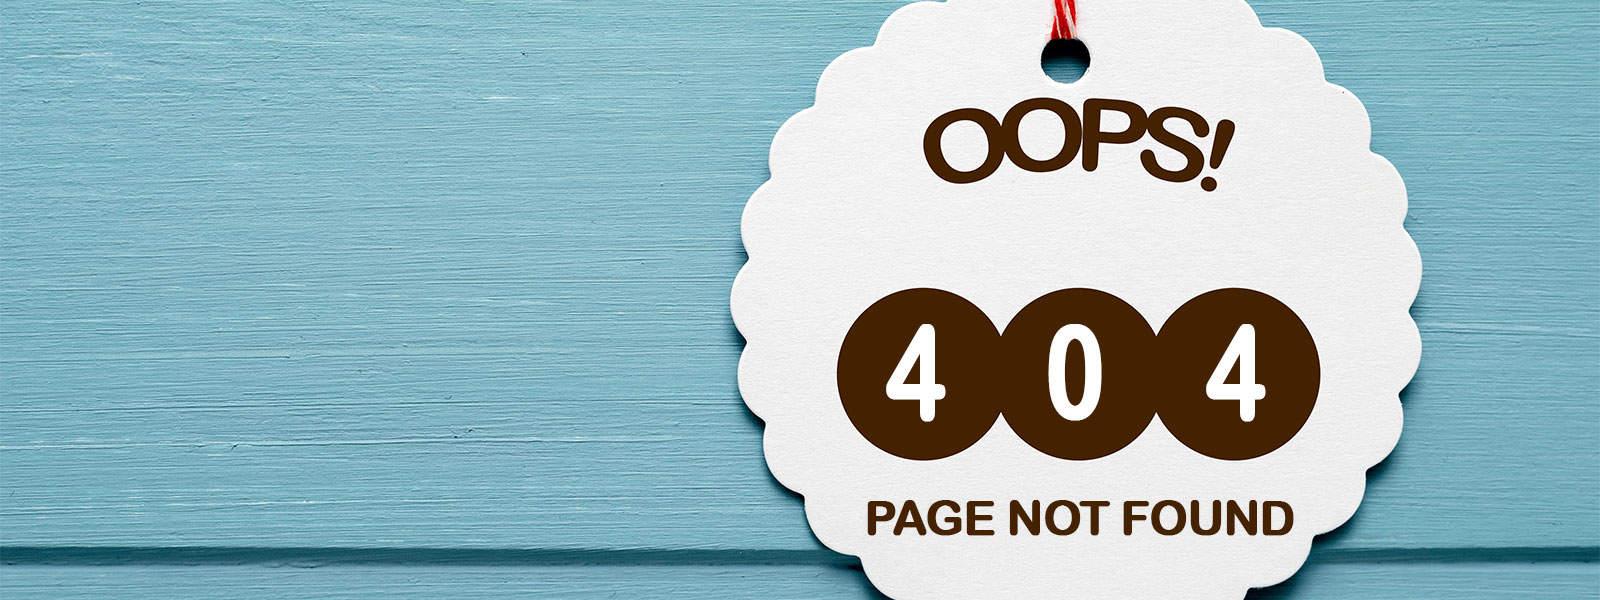 Error 404 page not found image